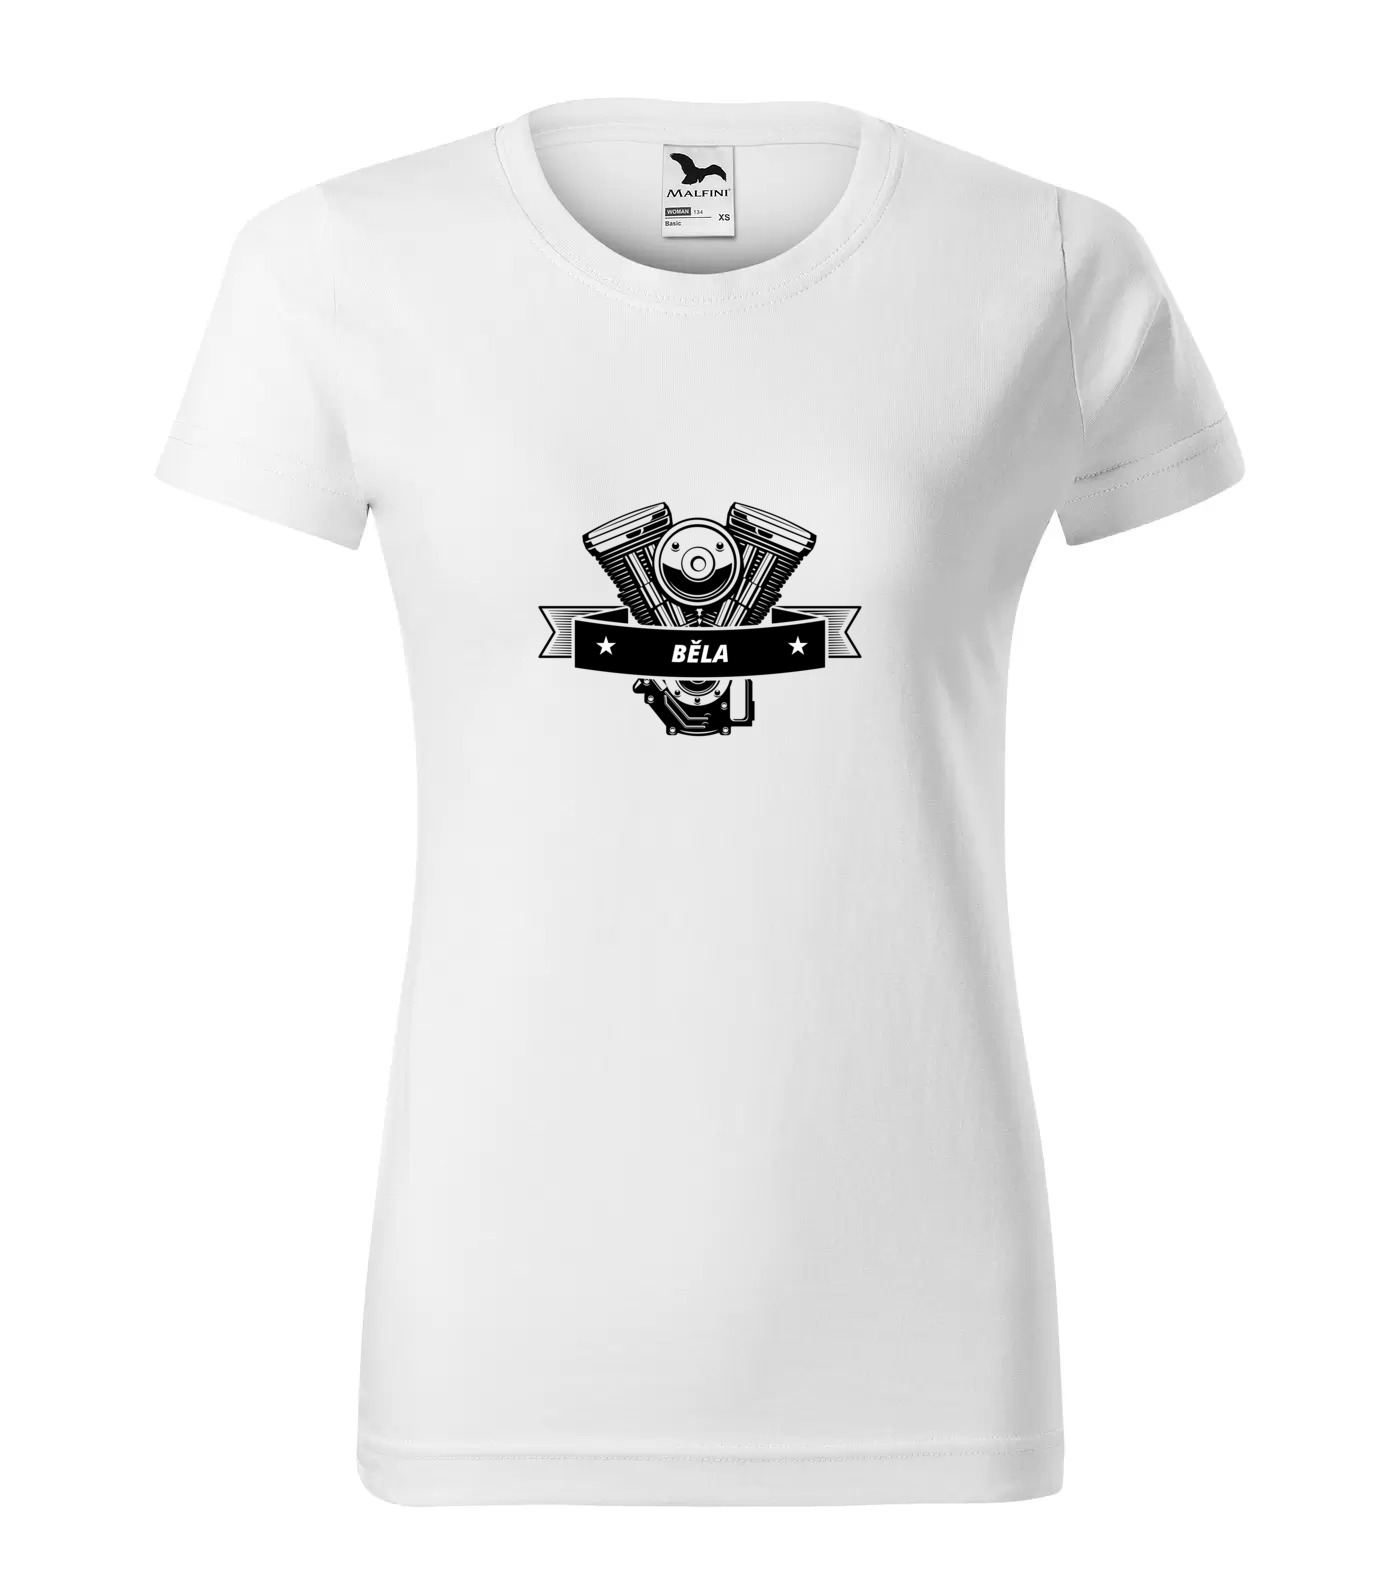 Tričko Motorkářka Běla